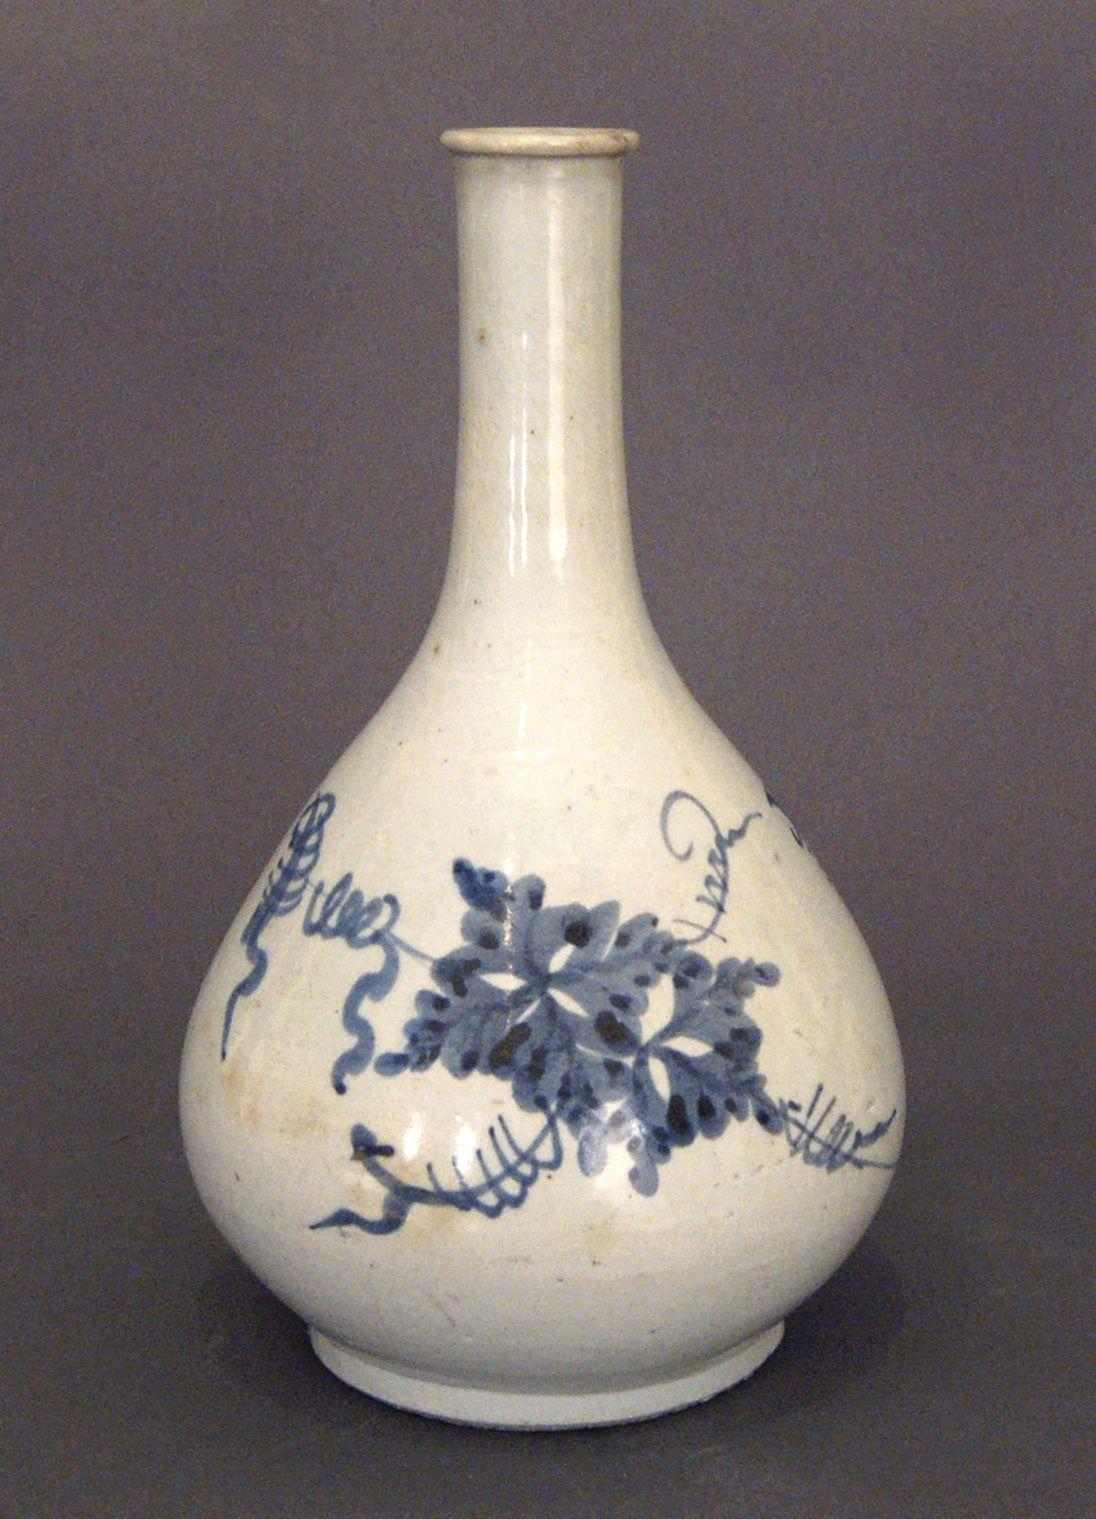 Blue and White Porcelain Bottle